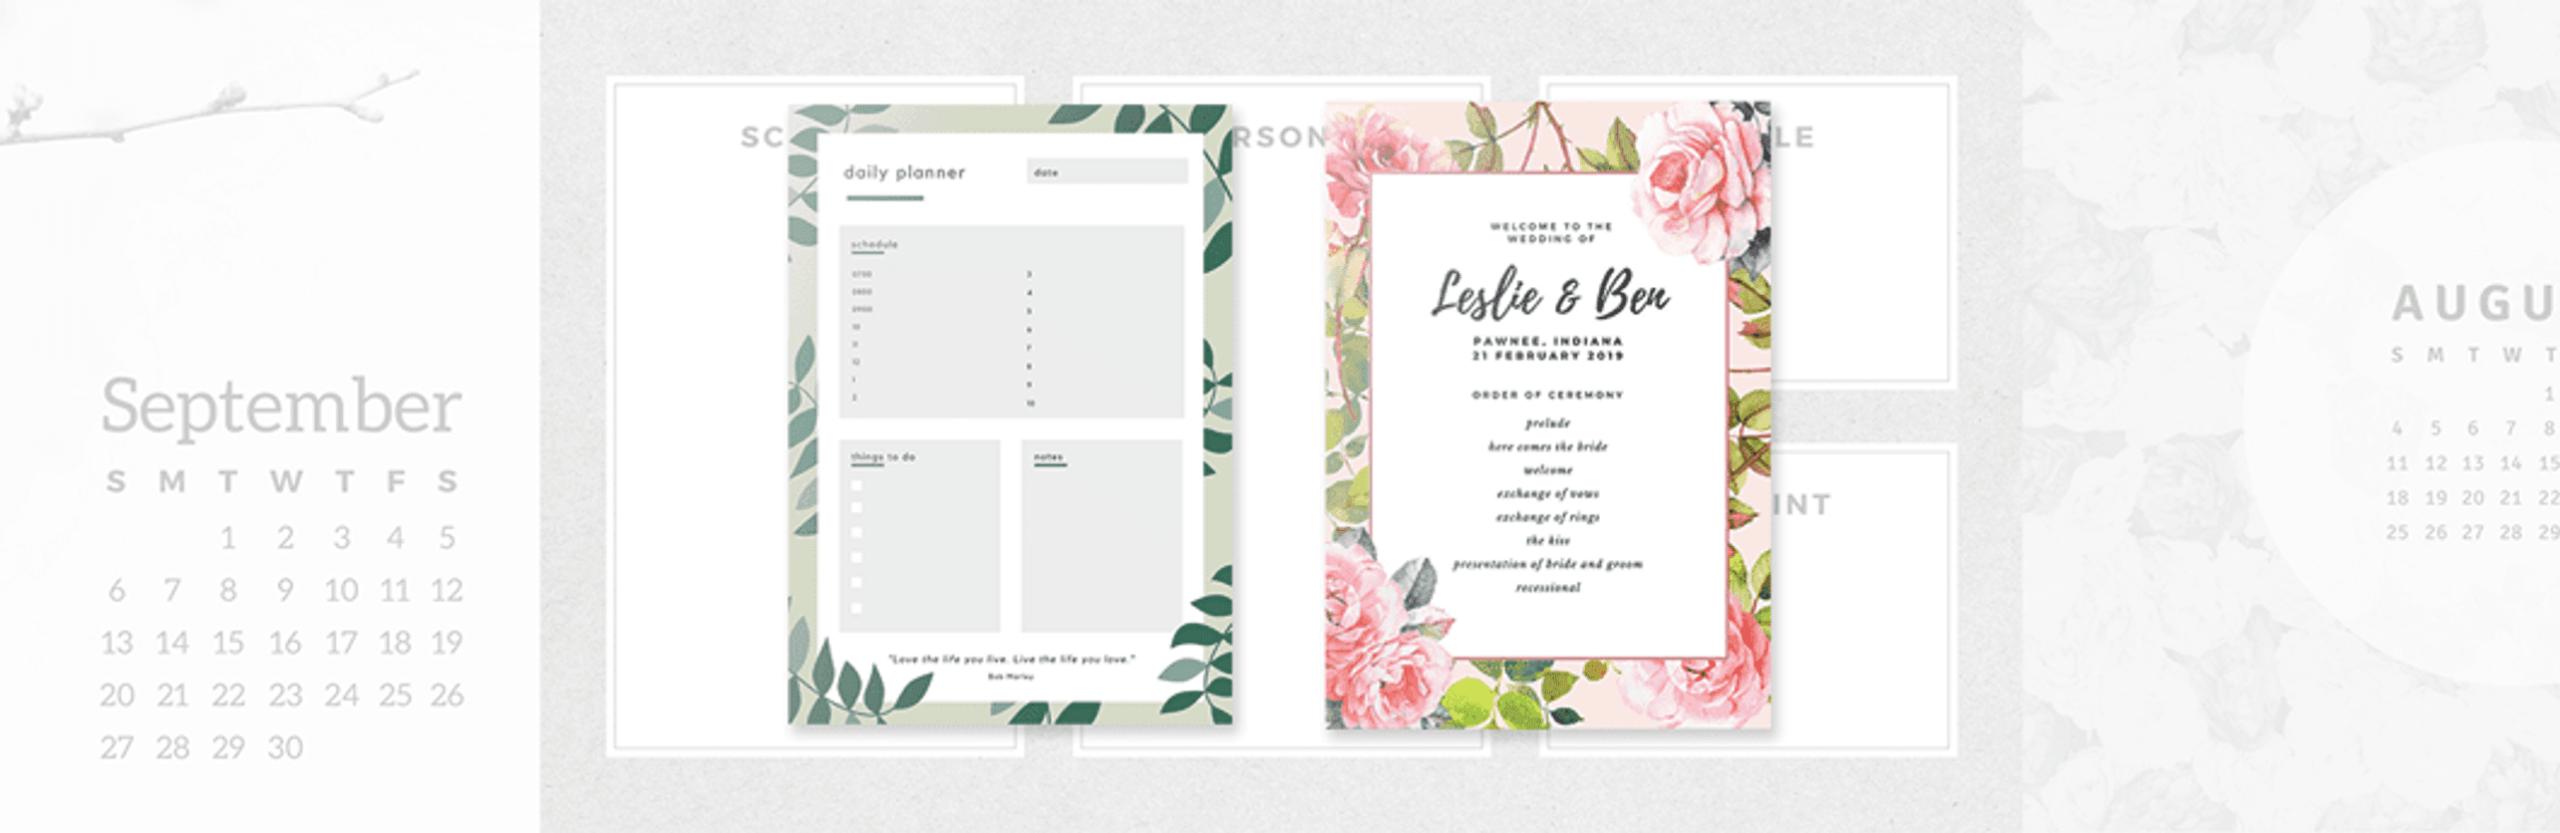 Free Online Calendar Maker: Design A Custom Calendar  Canva with regard to Canva Calendar Maker